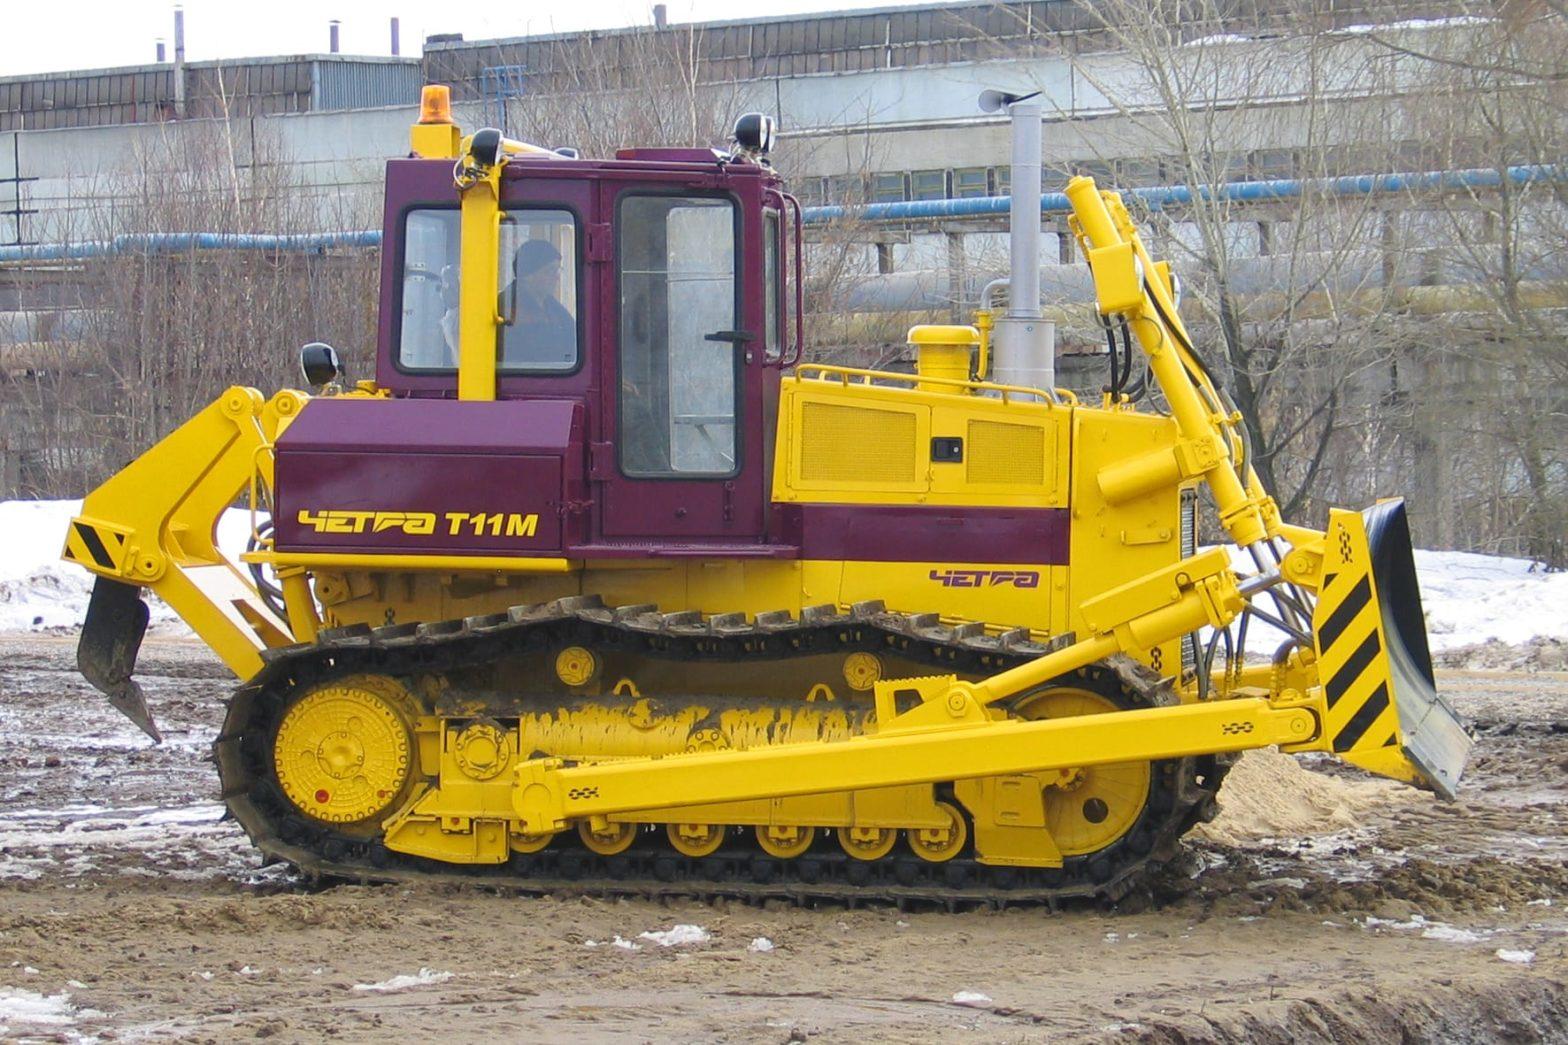 Бульдозер ЧЕТРА Т11 технические характеристики